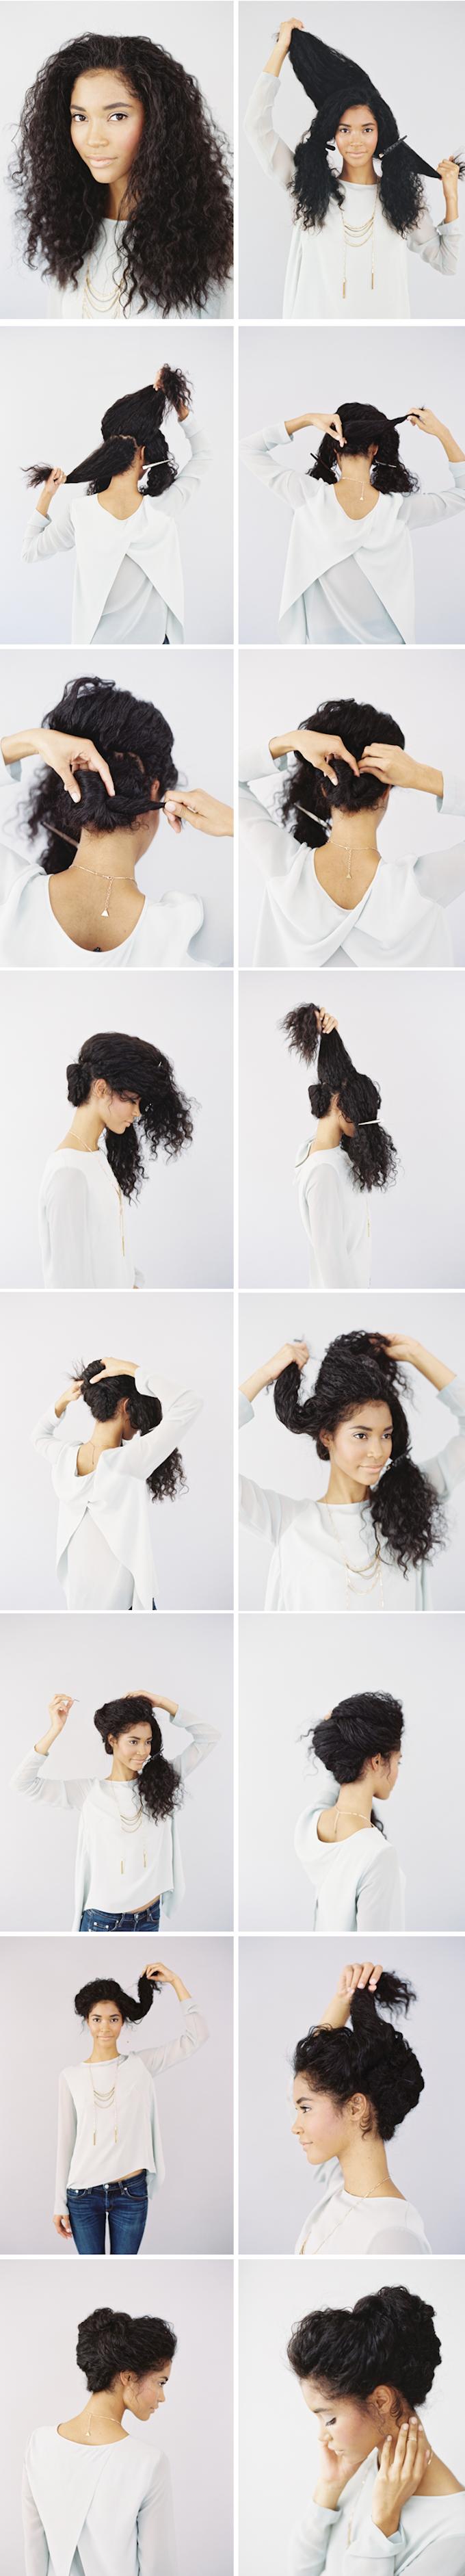 curls-understood-natural-hair-updos-34